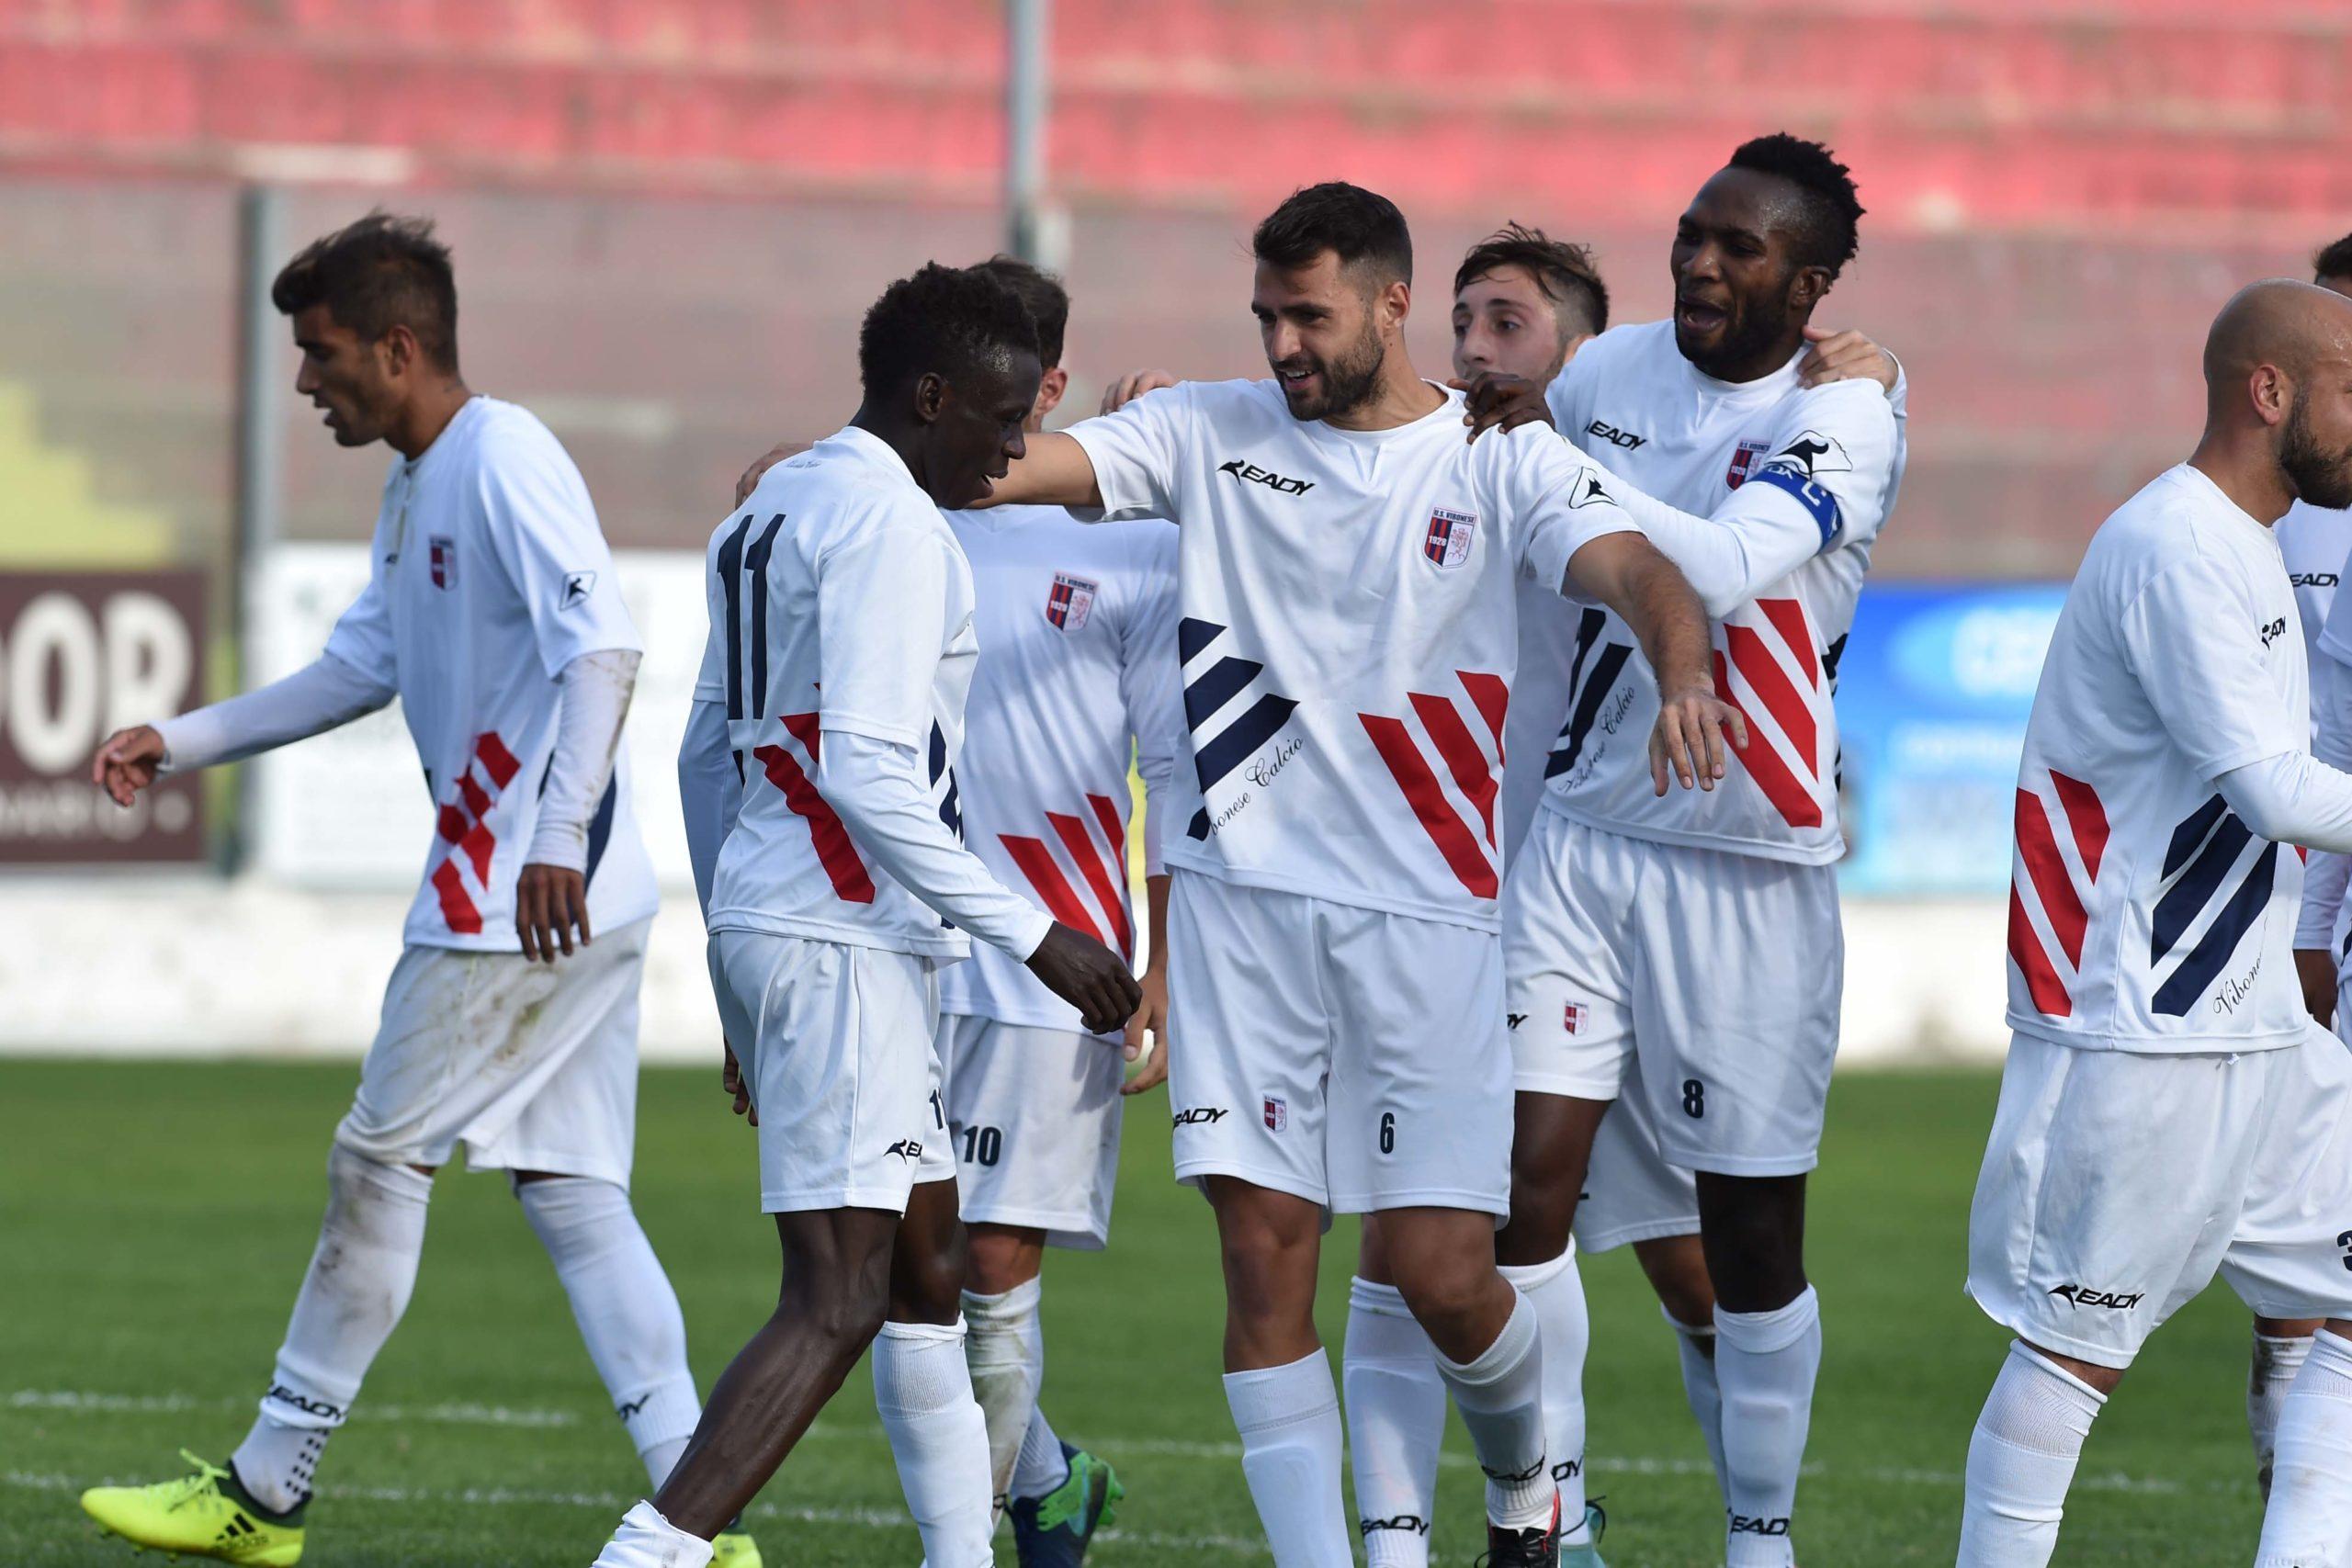 Vibonese - Paceco 5-0: Le foto immagine 5955 US Vibonese Calcio